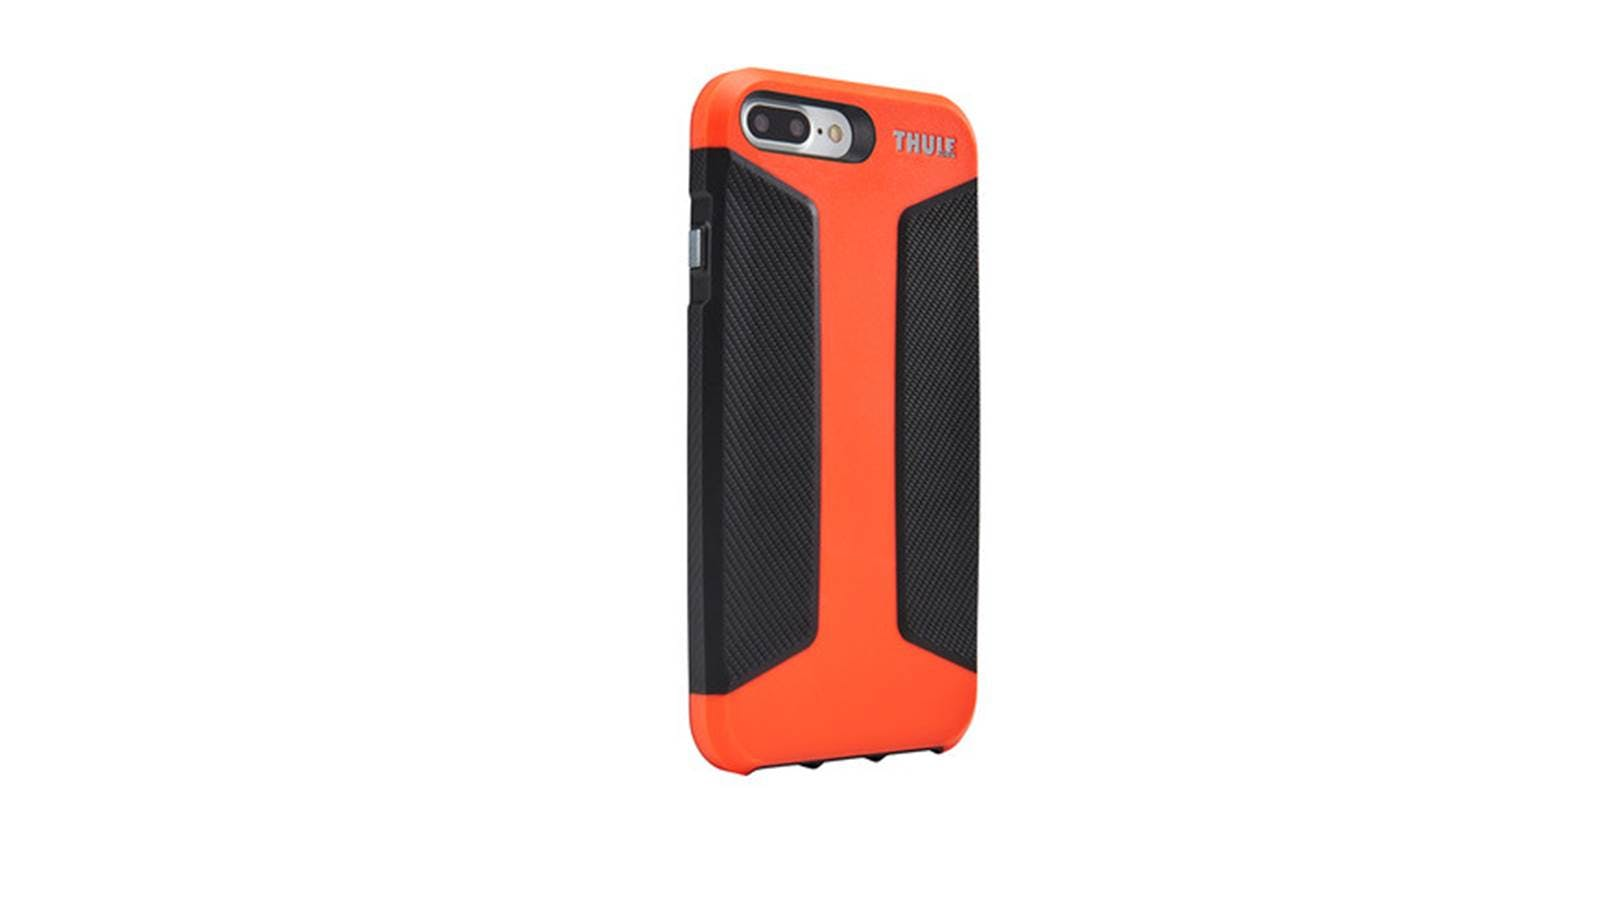 low priced 8c3df 091d4 Thule Atmos X3 TL-TAIE3127 iPhone 7 Plus Case - Fiery Coral/Dark Shadow